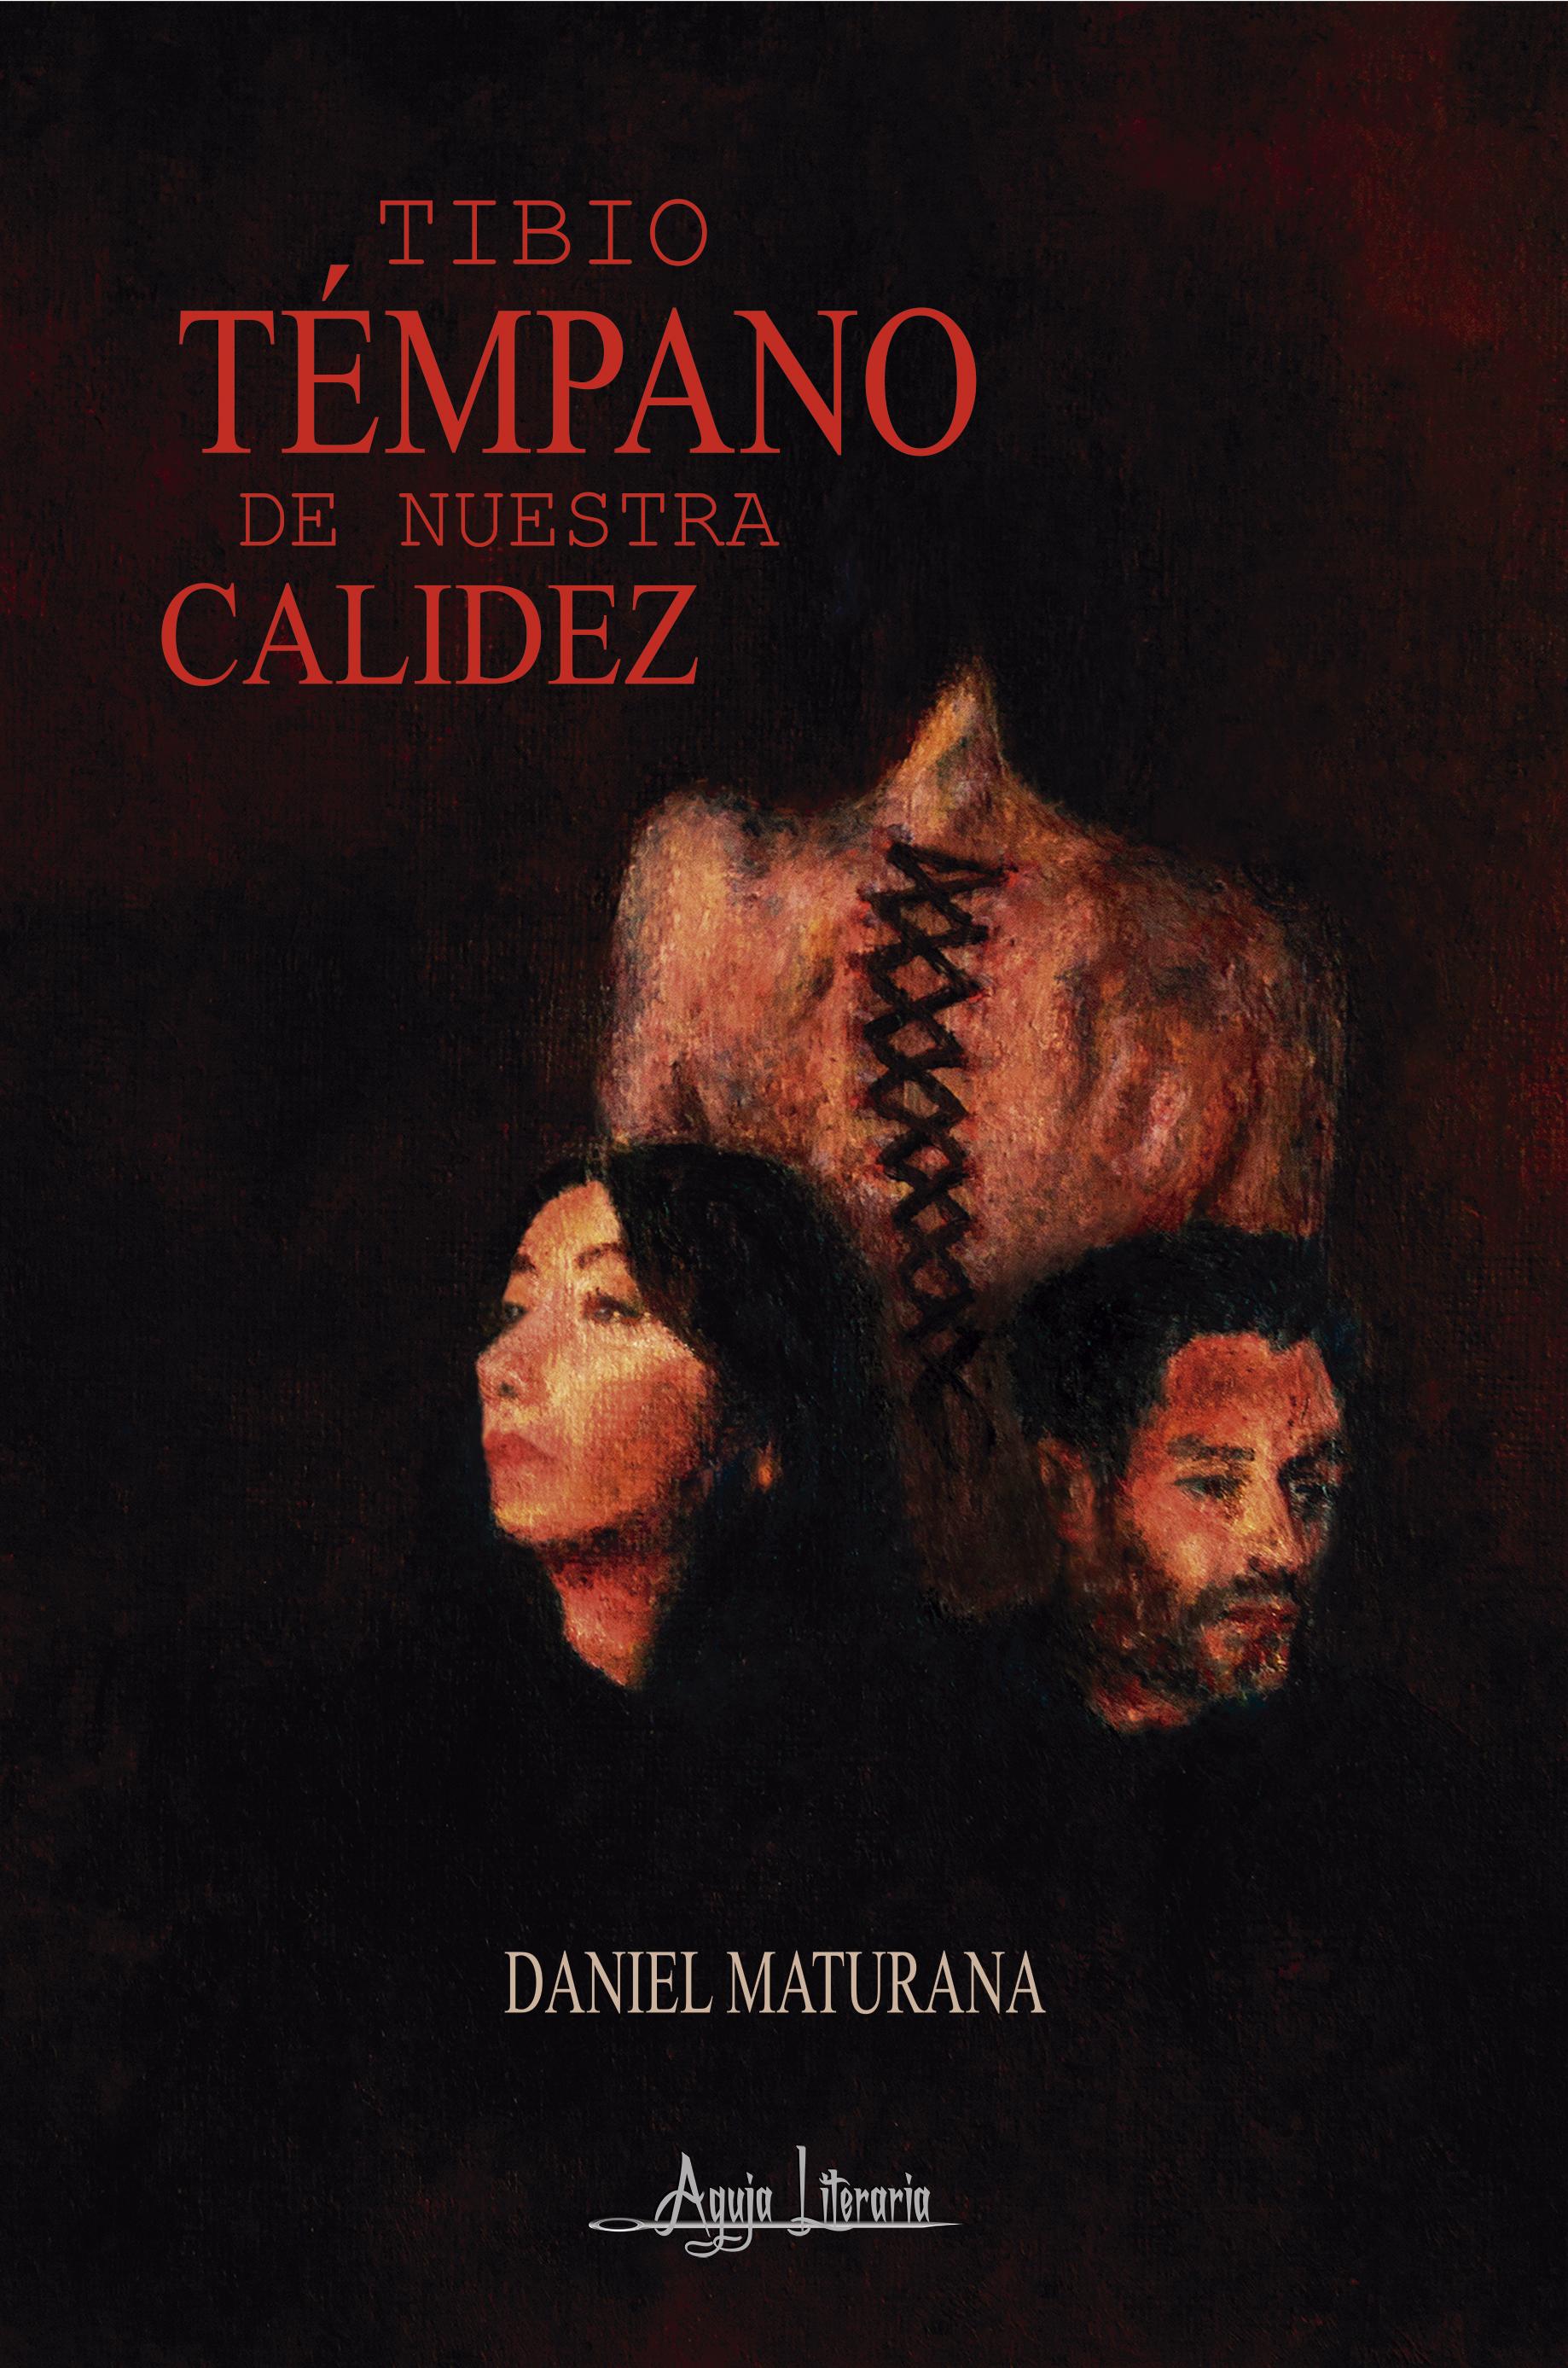 181213_Portada_Tibio_témpano